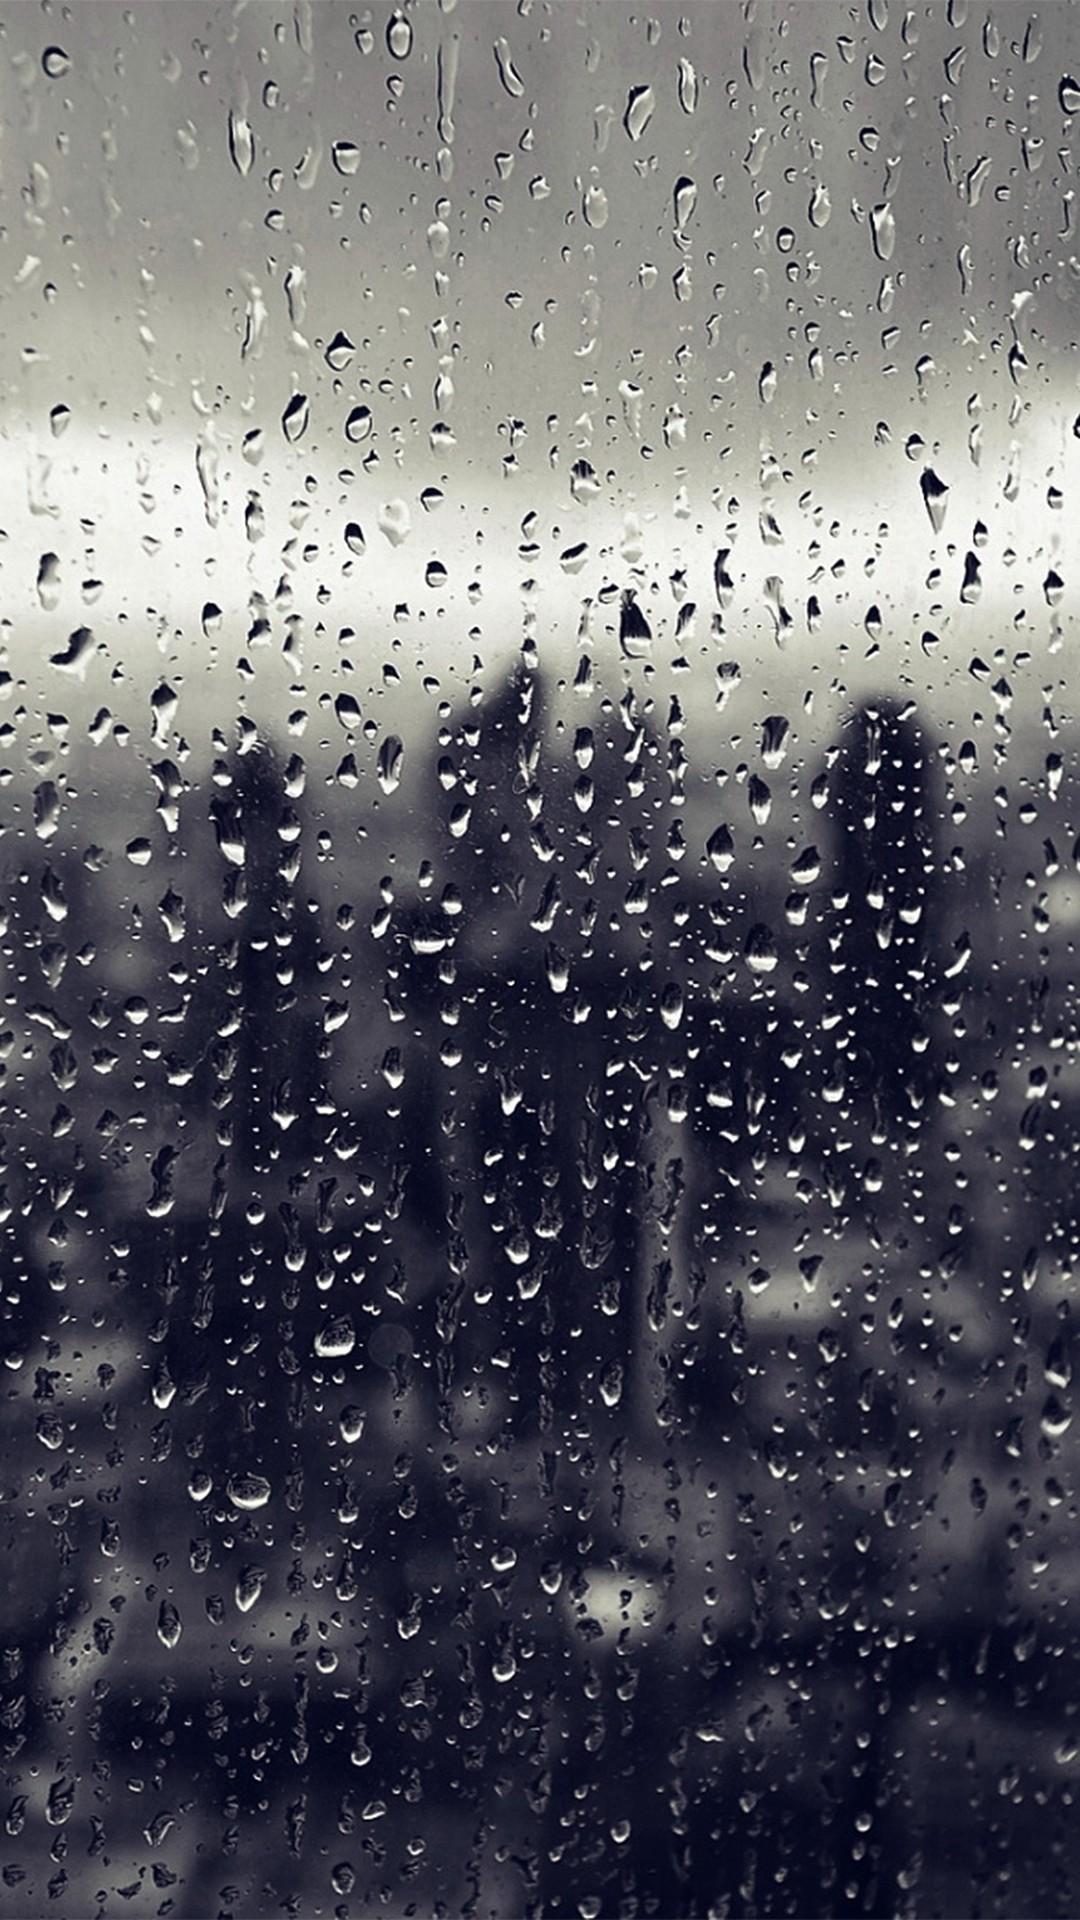 Rain On Window Wallpaper 1